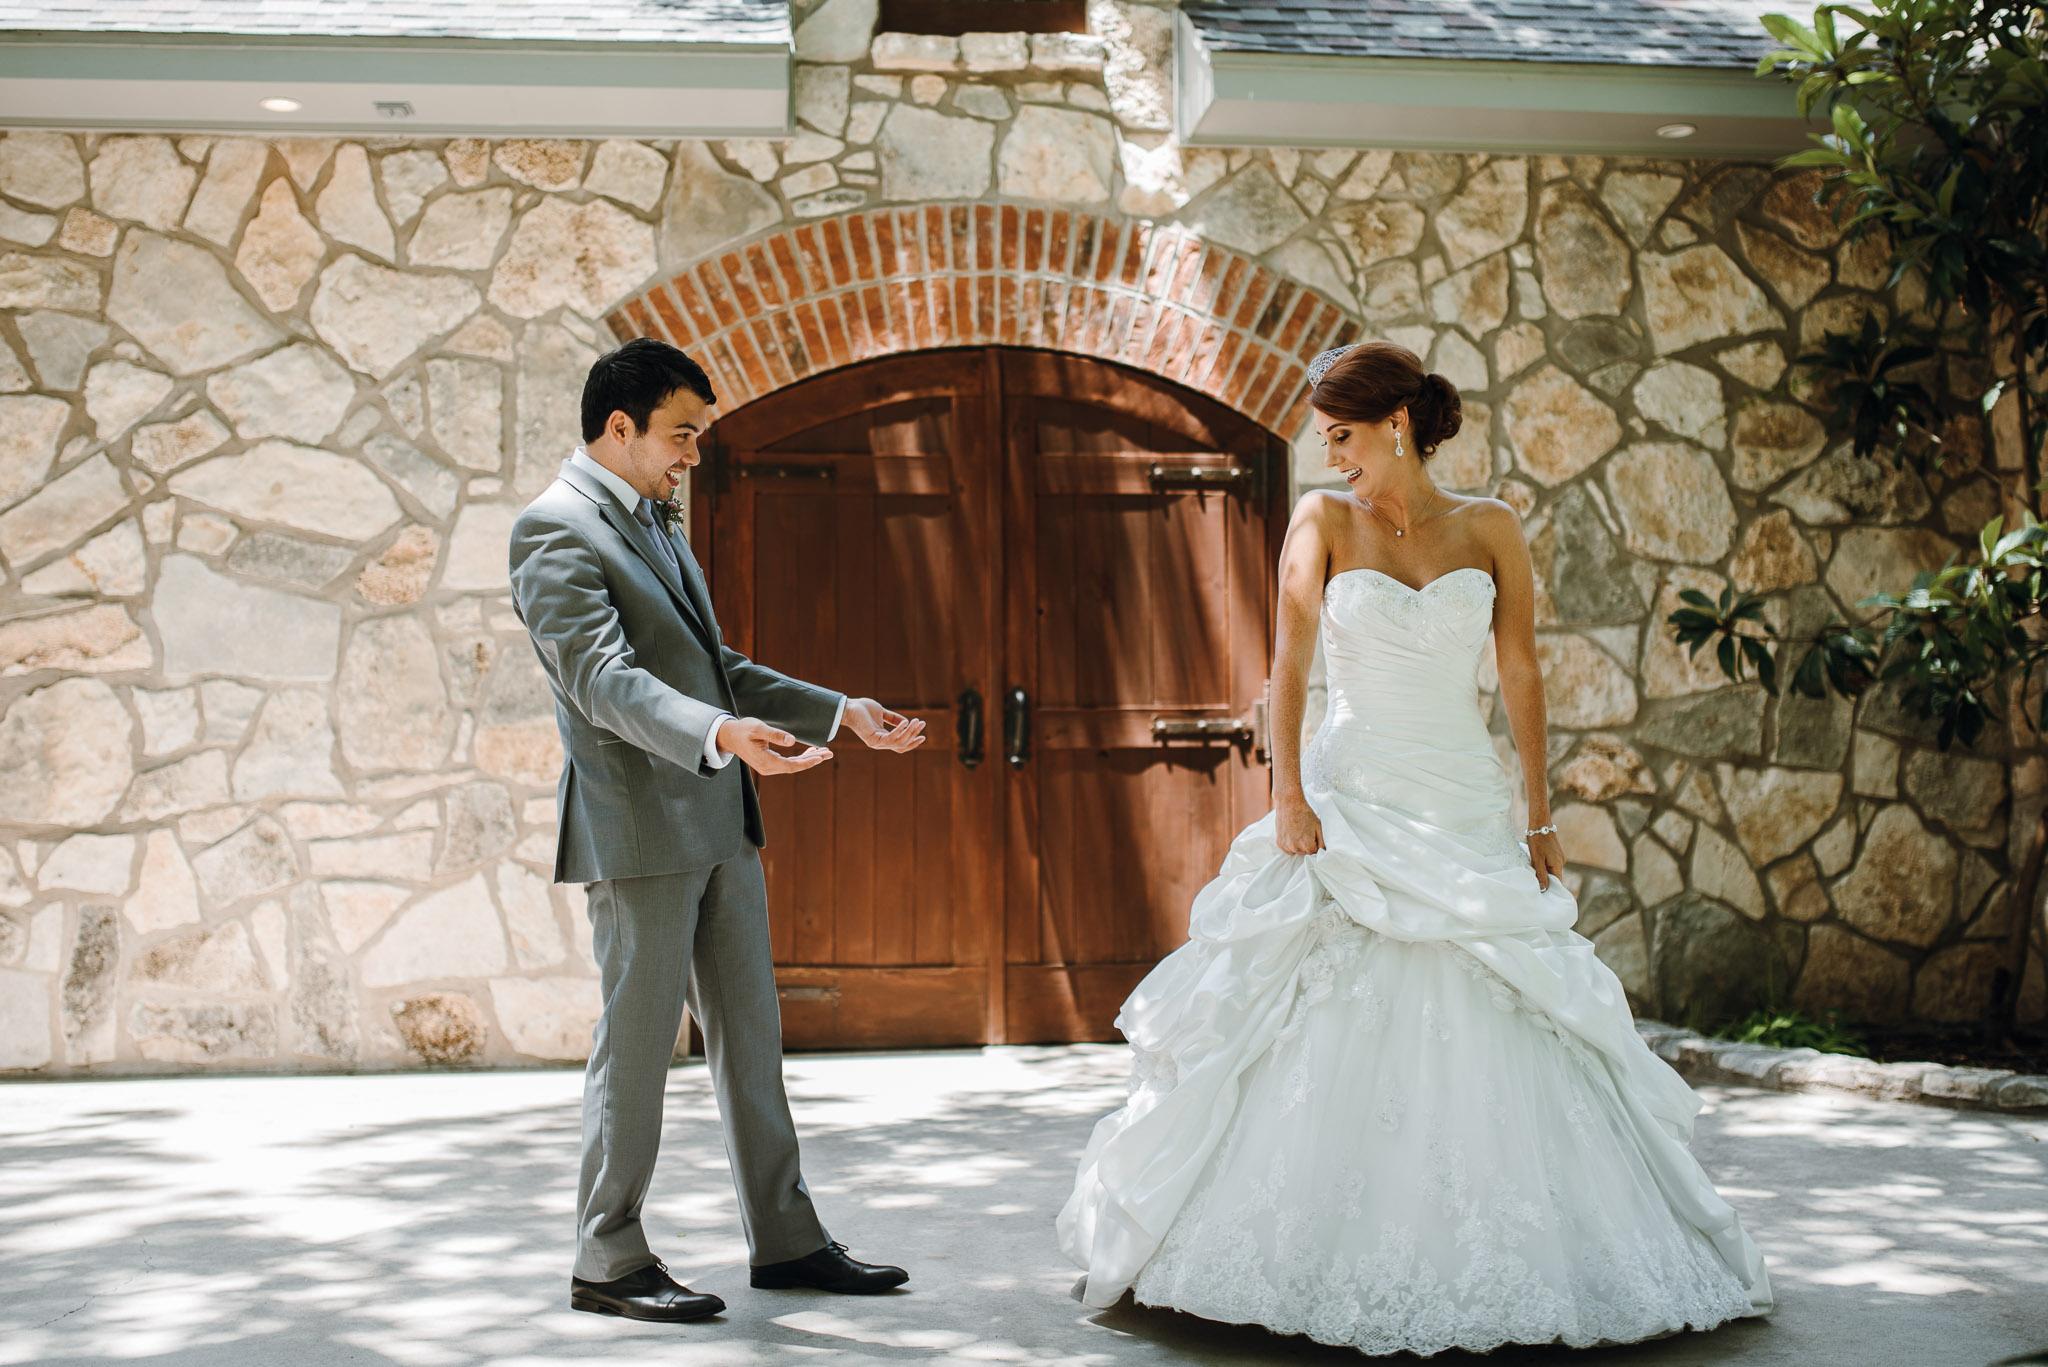 Chapel-In-The-Vineyard-Christoval-Vineyards-and-Winery-Wedding_Kayla&Eric-0019.jpg